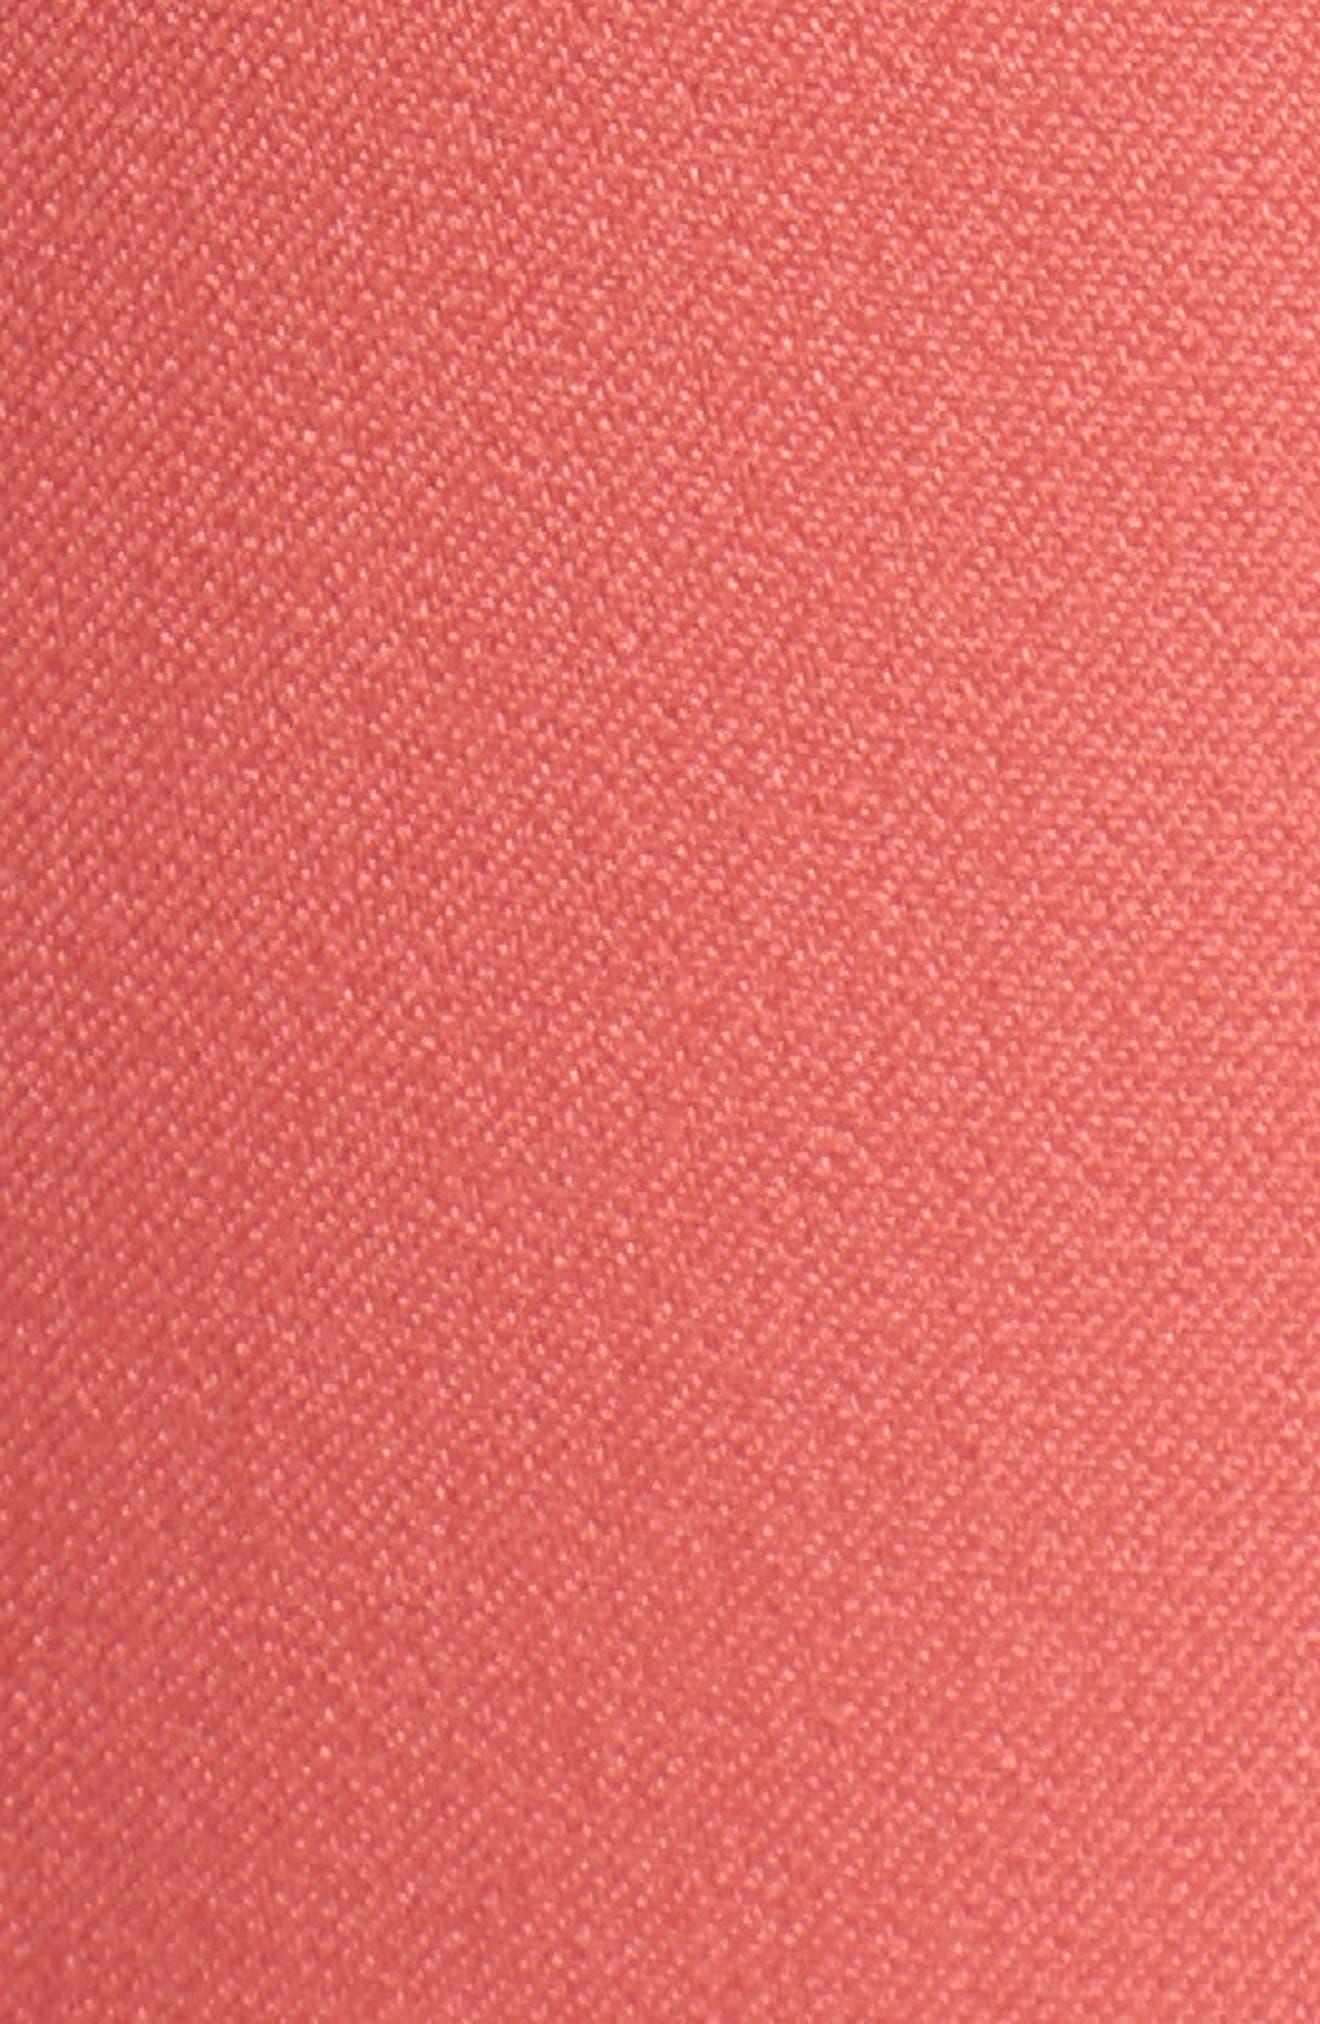 Skinny Stretch Pants,                             Alternate thumbnail 6, color,                             Coral Sugar